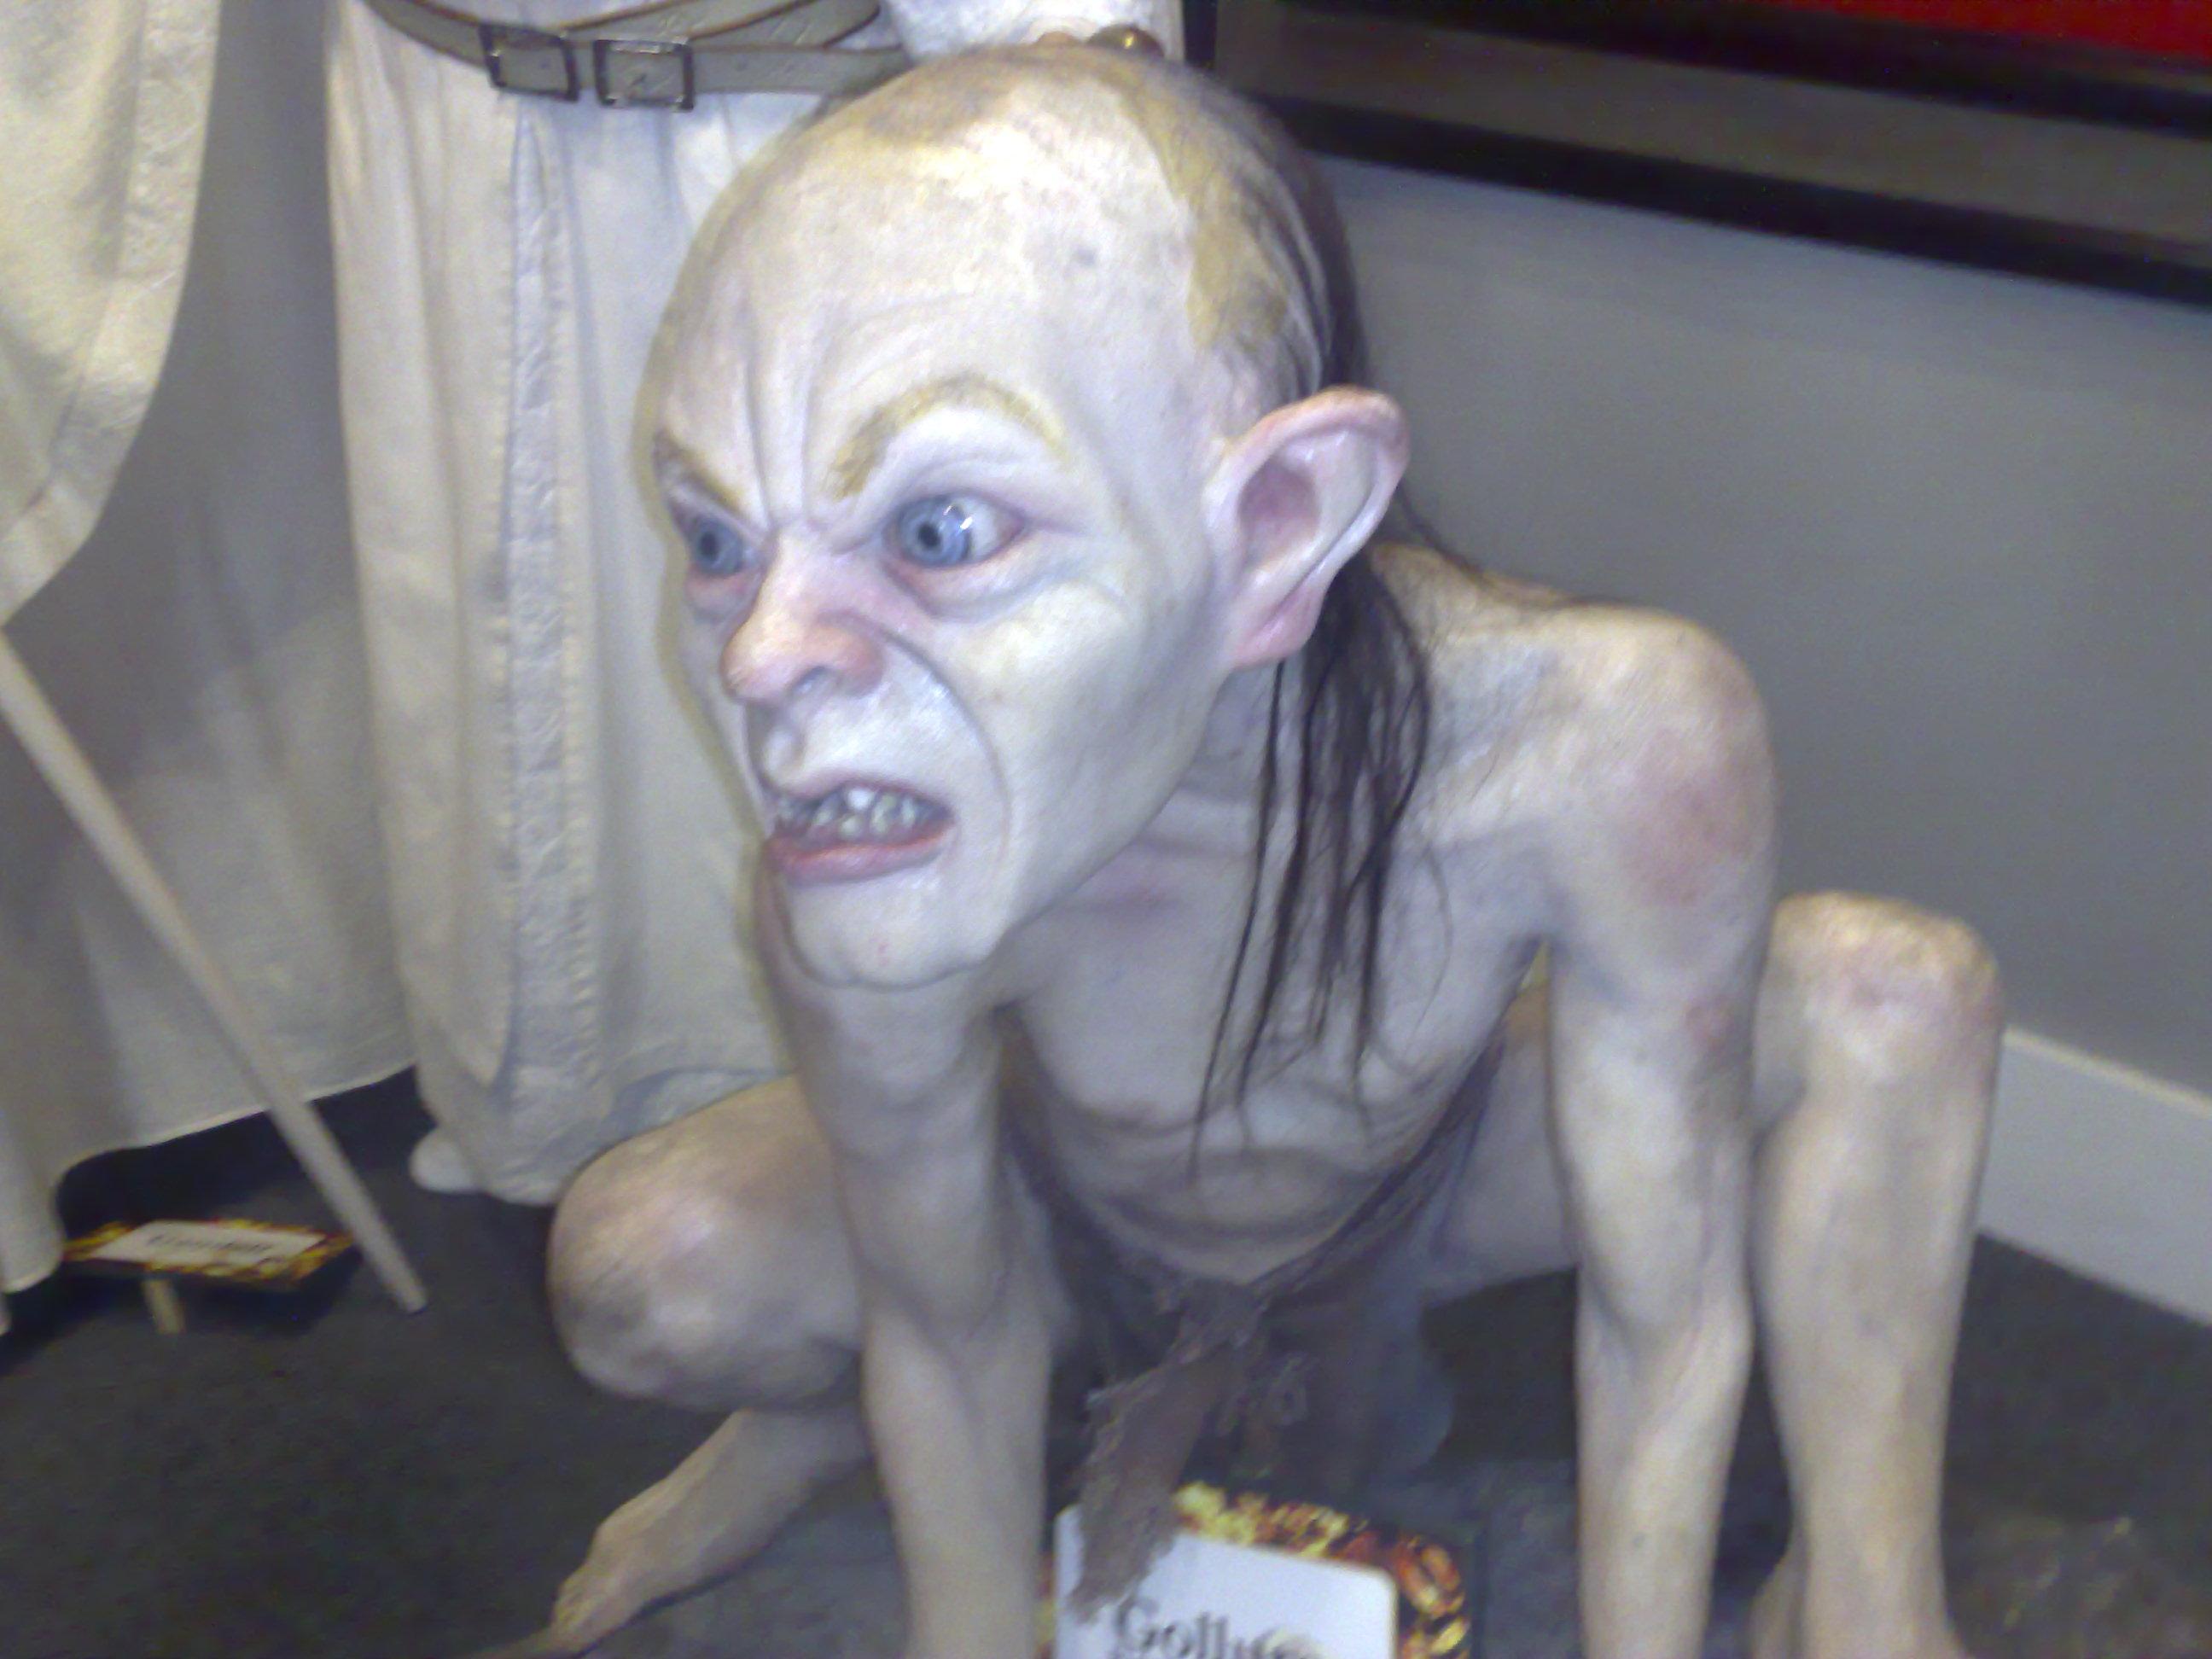 File:Gollum wax museum mexico city.jpg